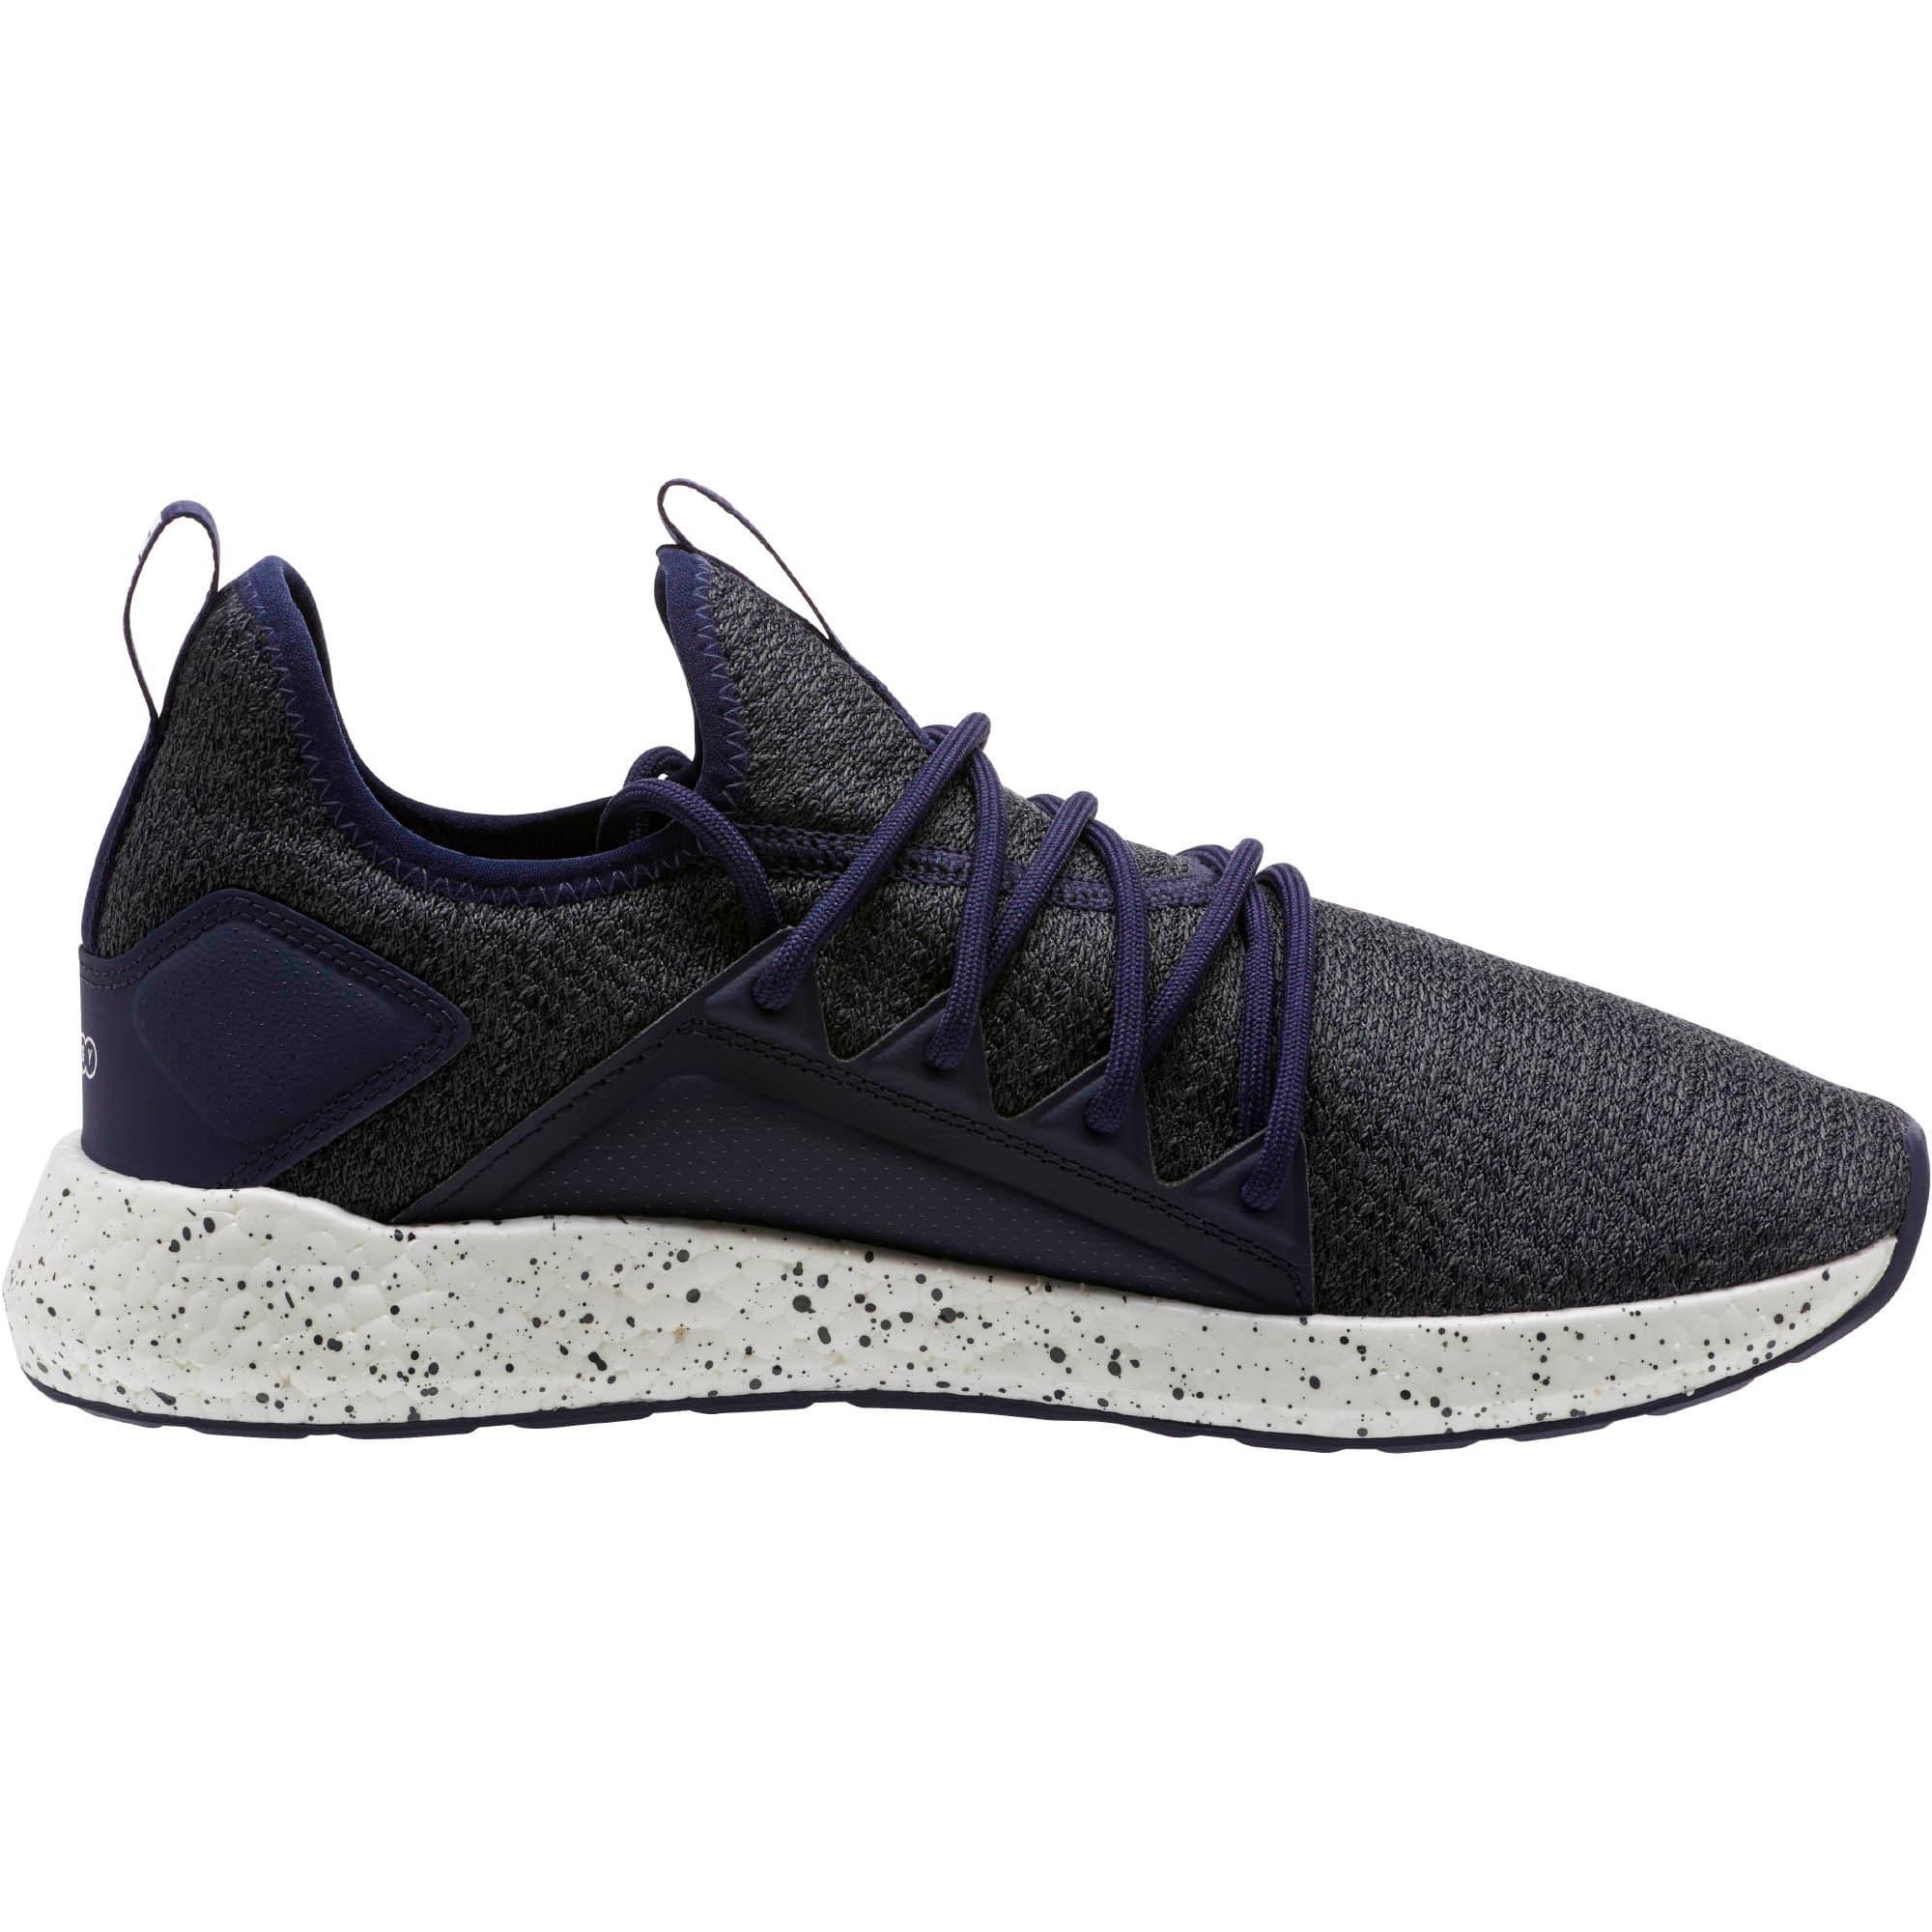 Thumbnail 3 of NRGY Neko Knit Speckle Men's Running Shoes, Peacoat-Puma White, medium